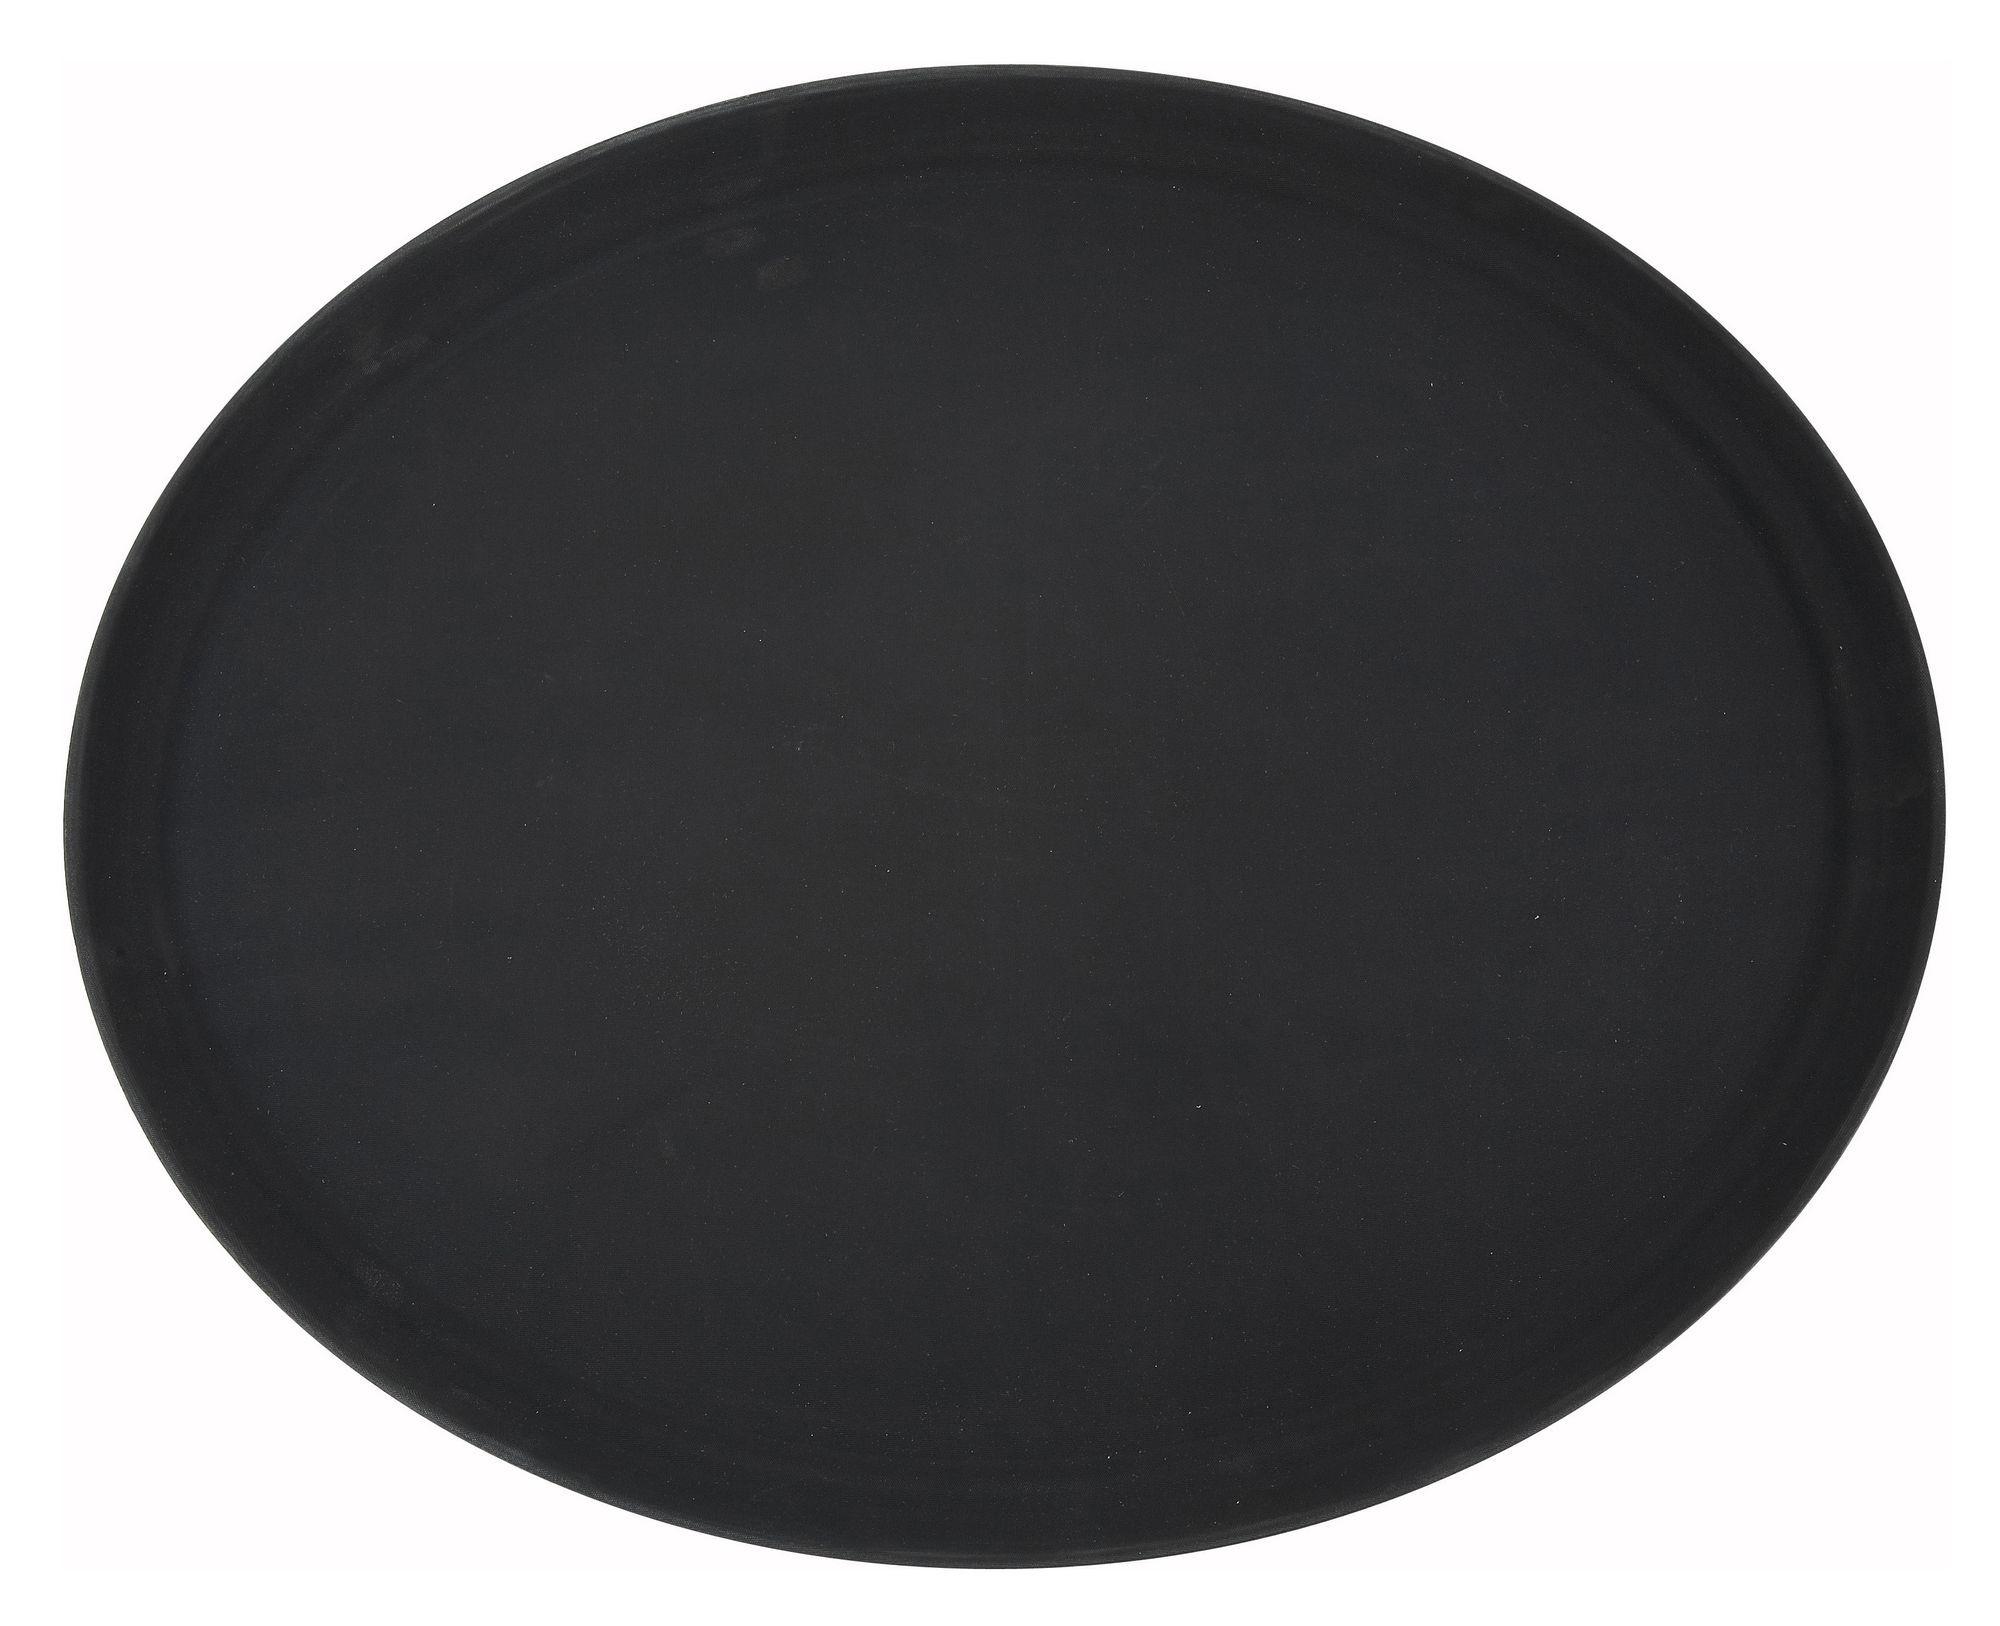 Winco TFG-2622K Black Oval Non-Slip Fiberglass Tray, 26'' x 22'